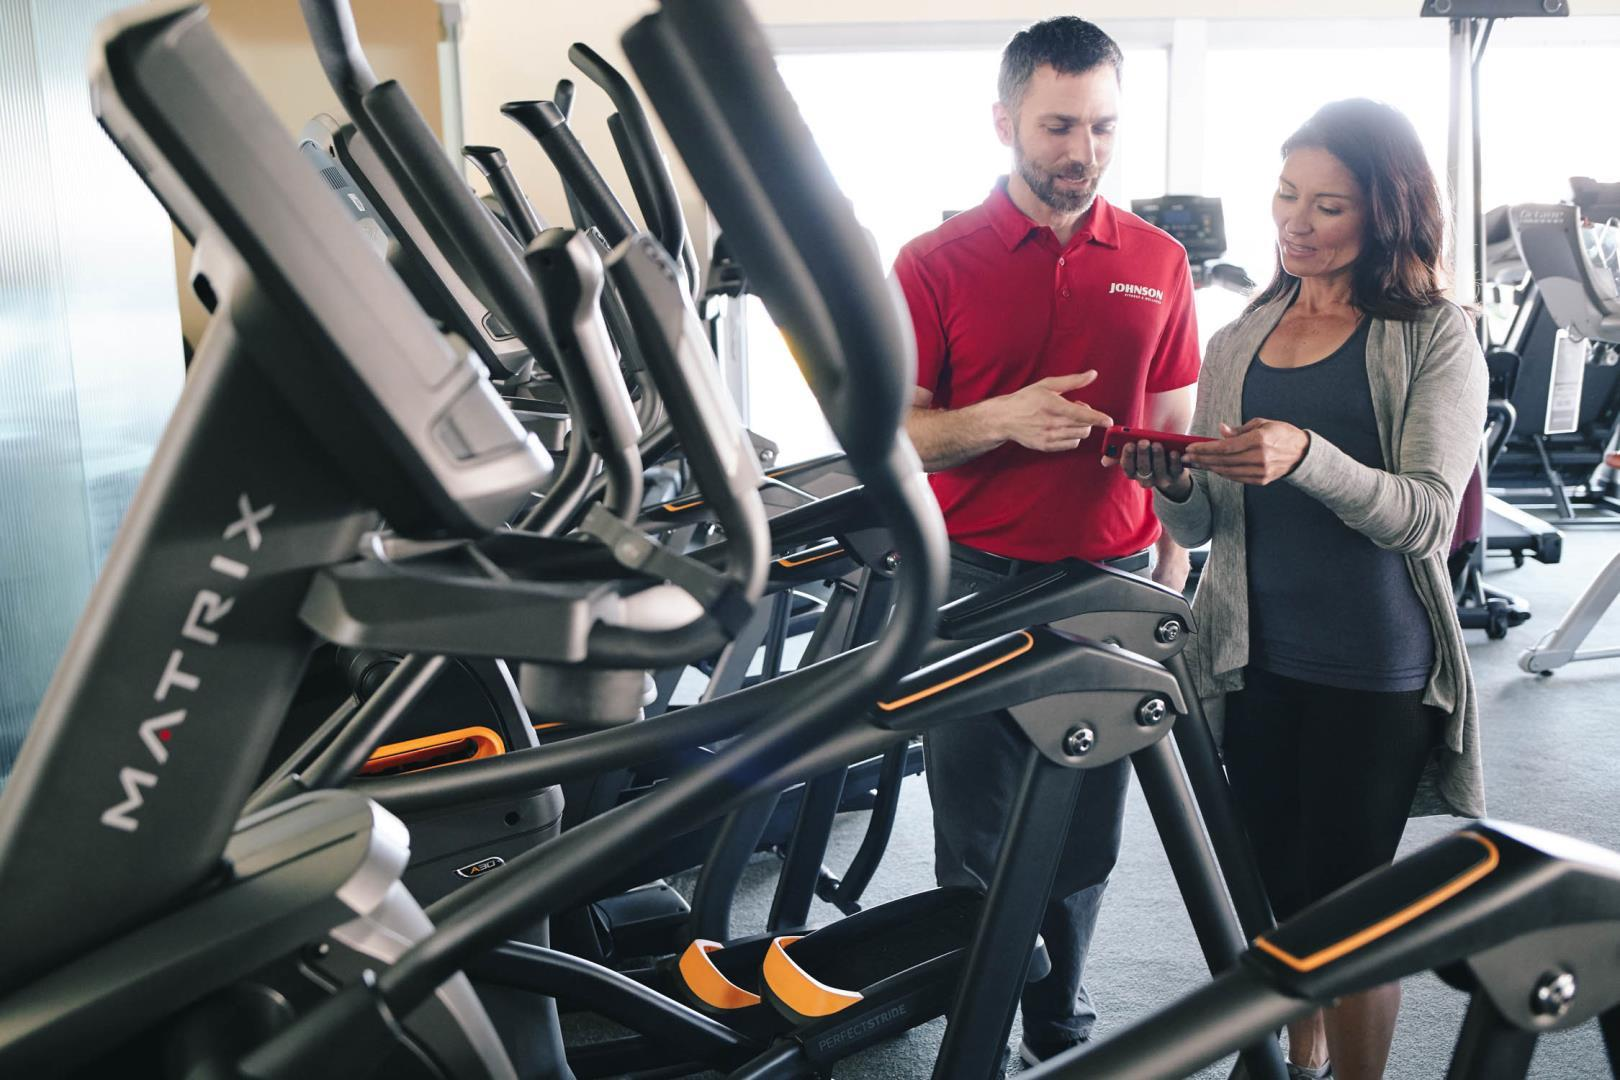 Johnson Fitness & Wellness - Sunrise, FL - COMING SOON